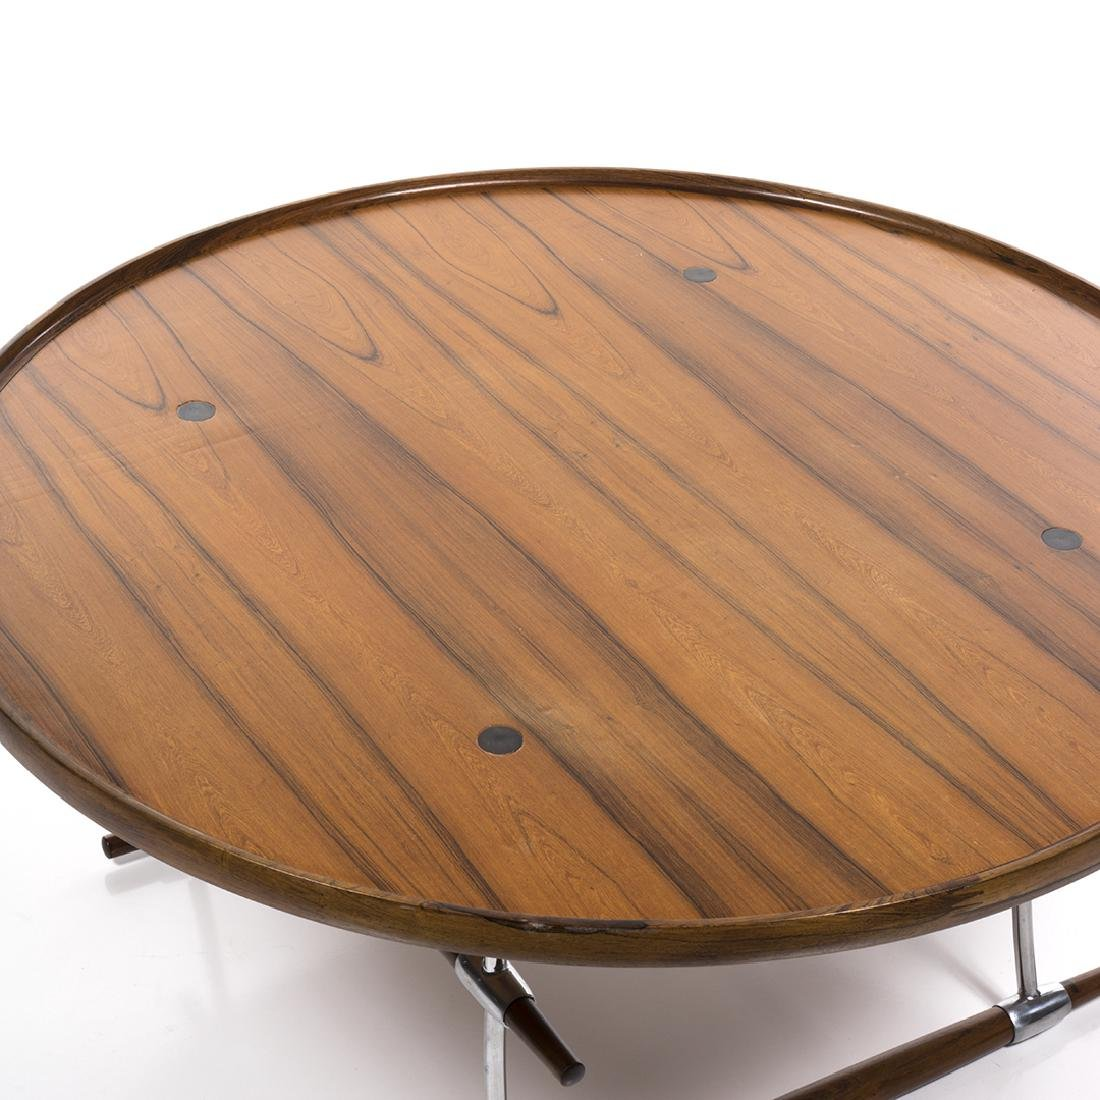 Jens Quistgaard Stokke Table - 3